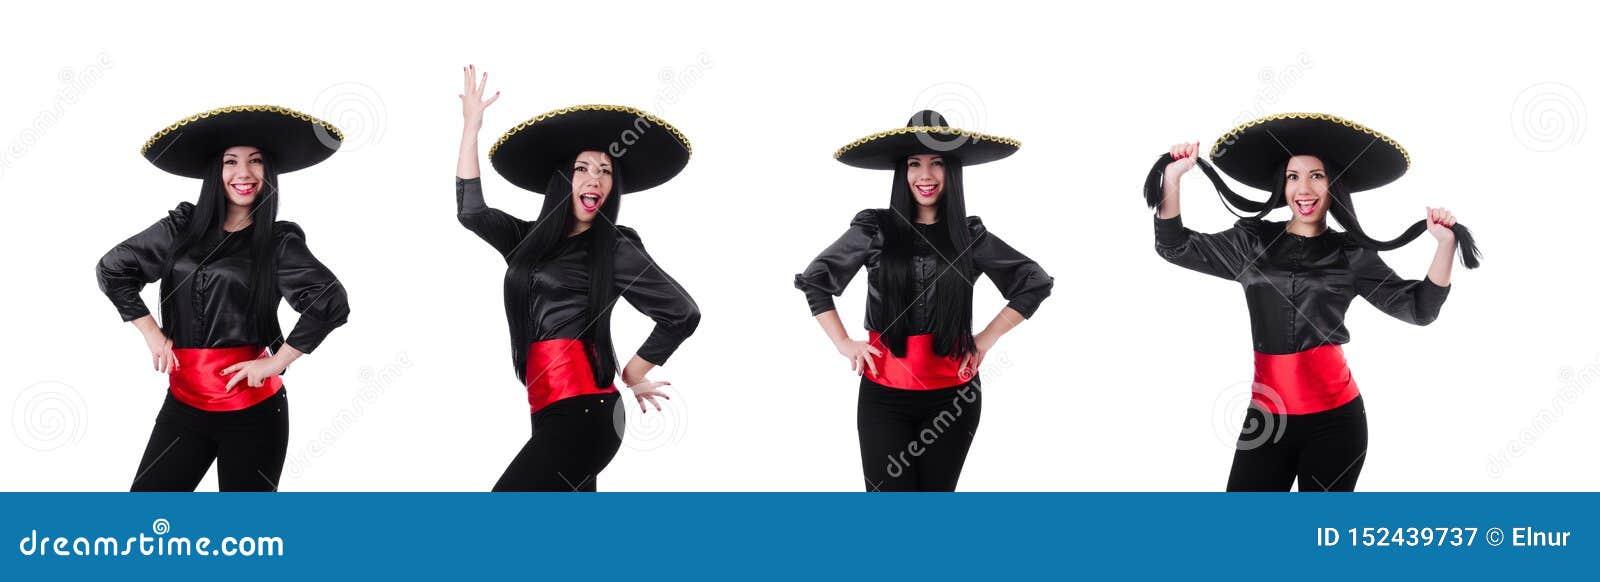 Mulher mexicana isolada no fundo branco